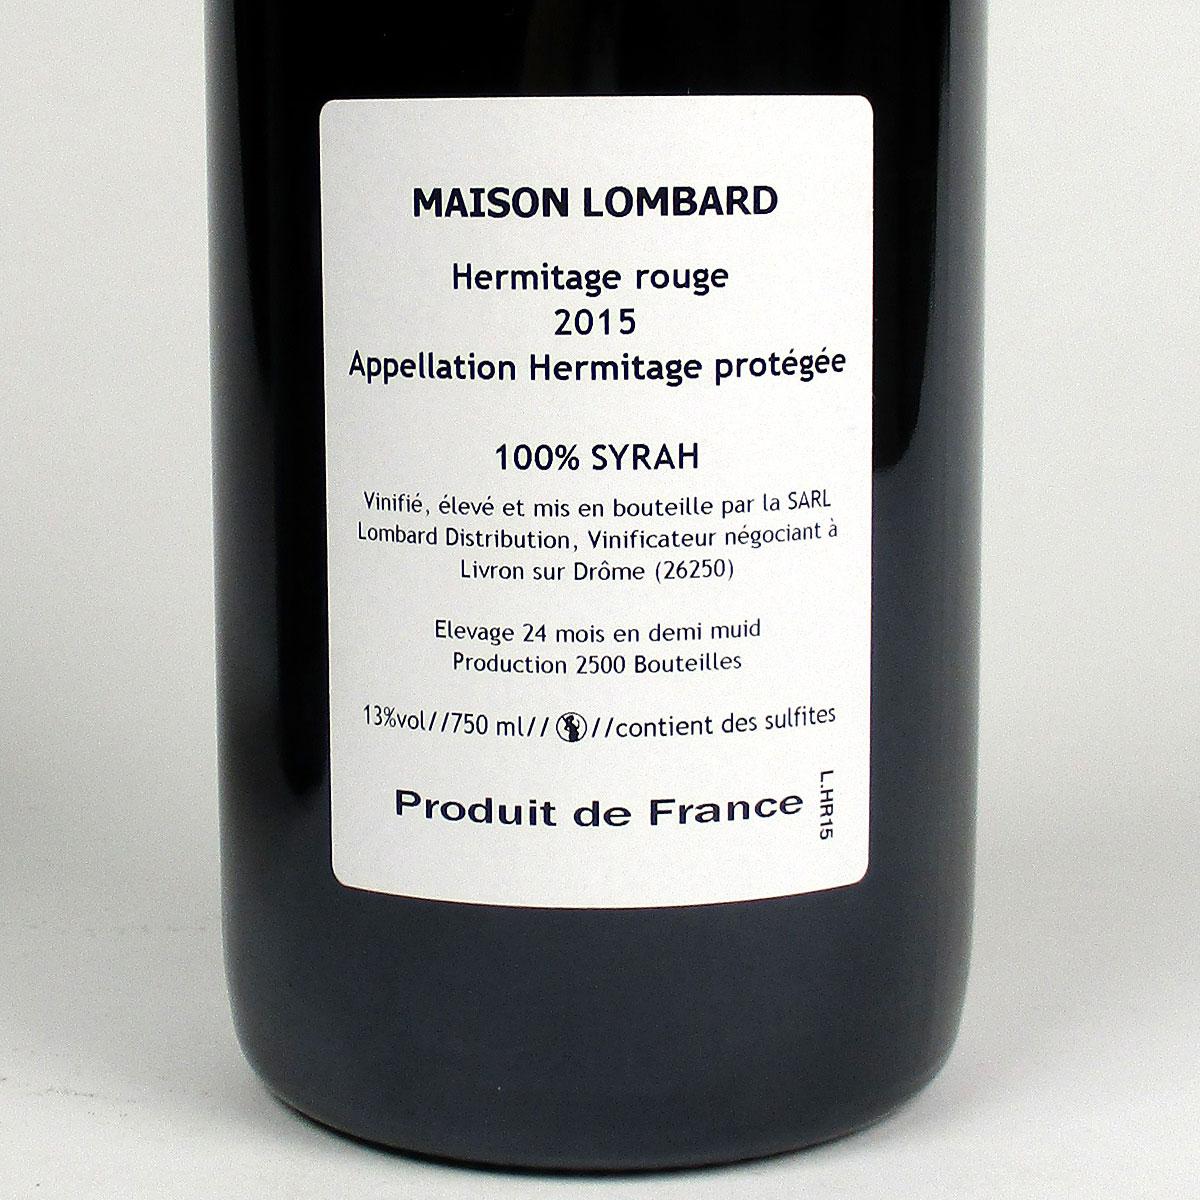 Hermitage: Maison Lombard 2015 - Bottle Rear Label